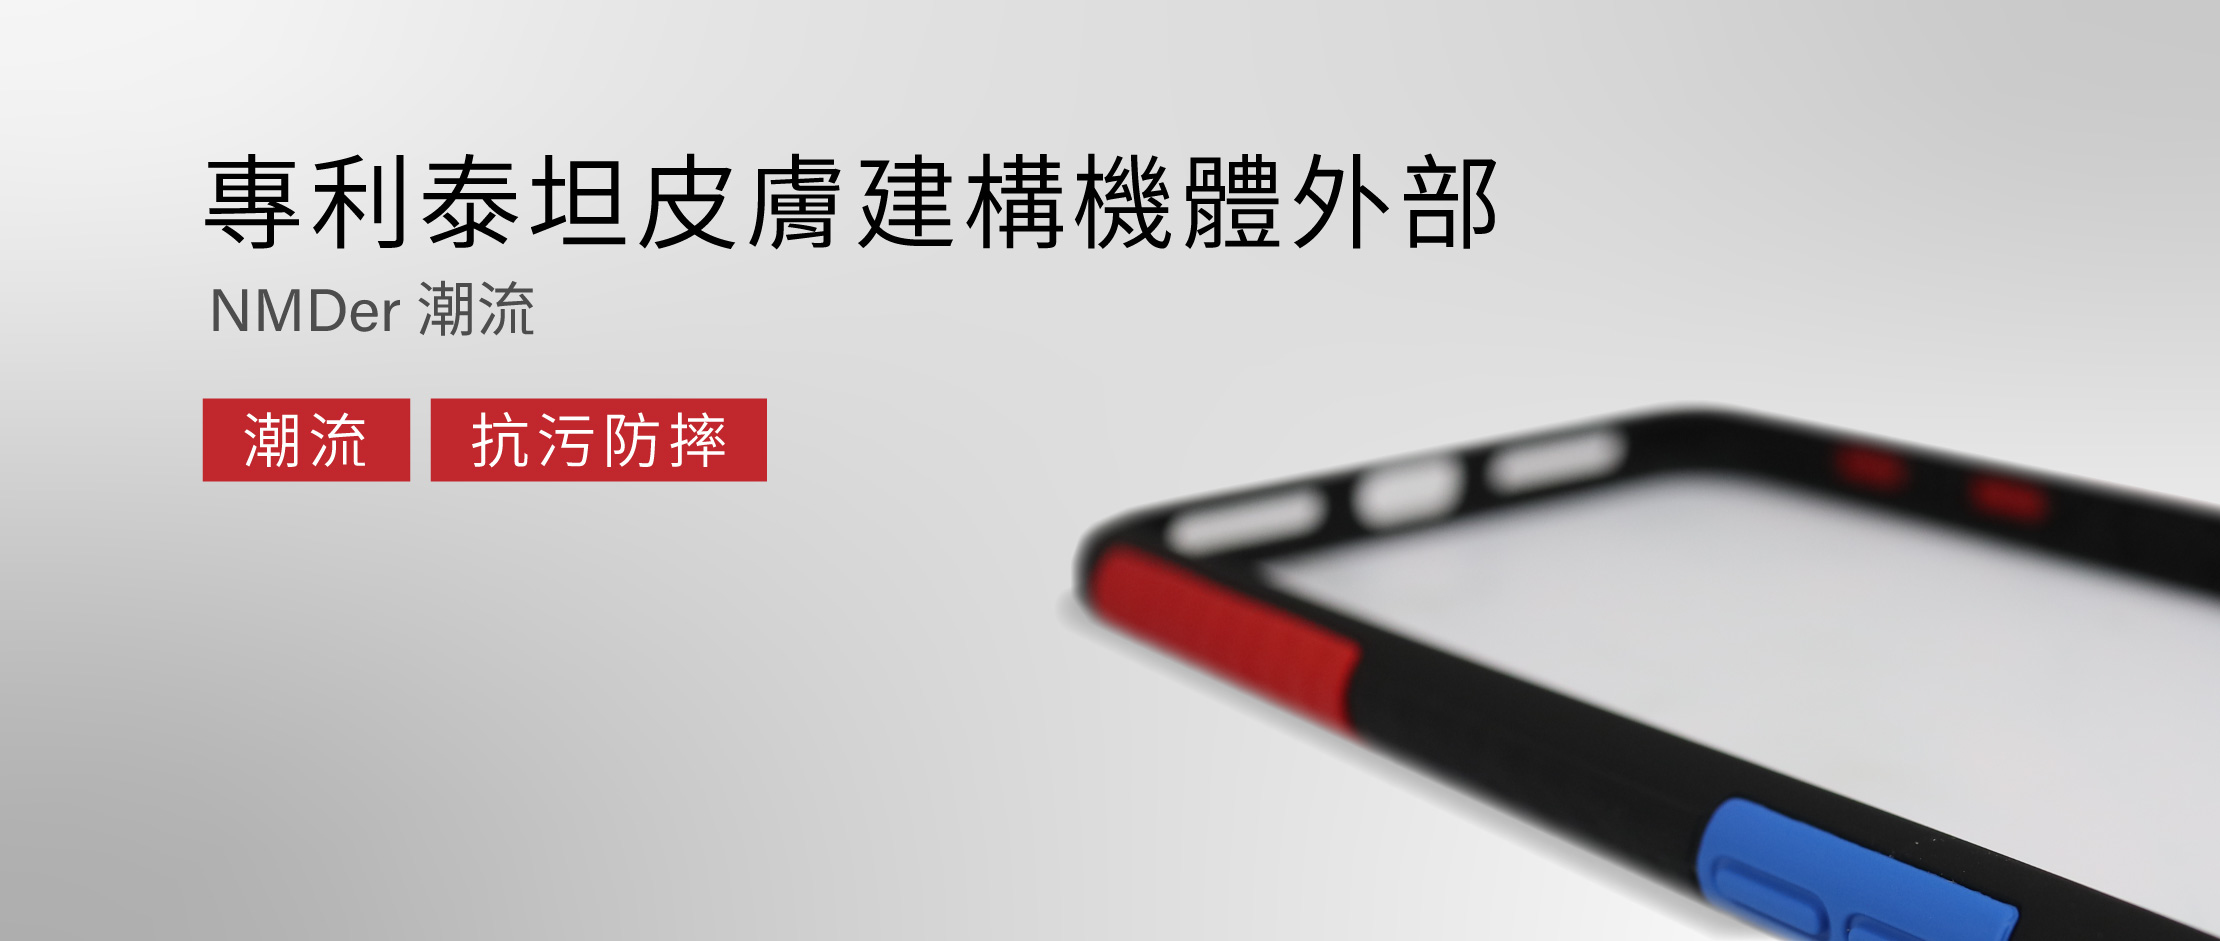 Telephant 太樂芬 NMDer iPhone X/Xs/XR/Max系列